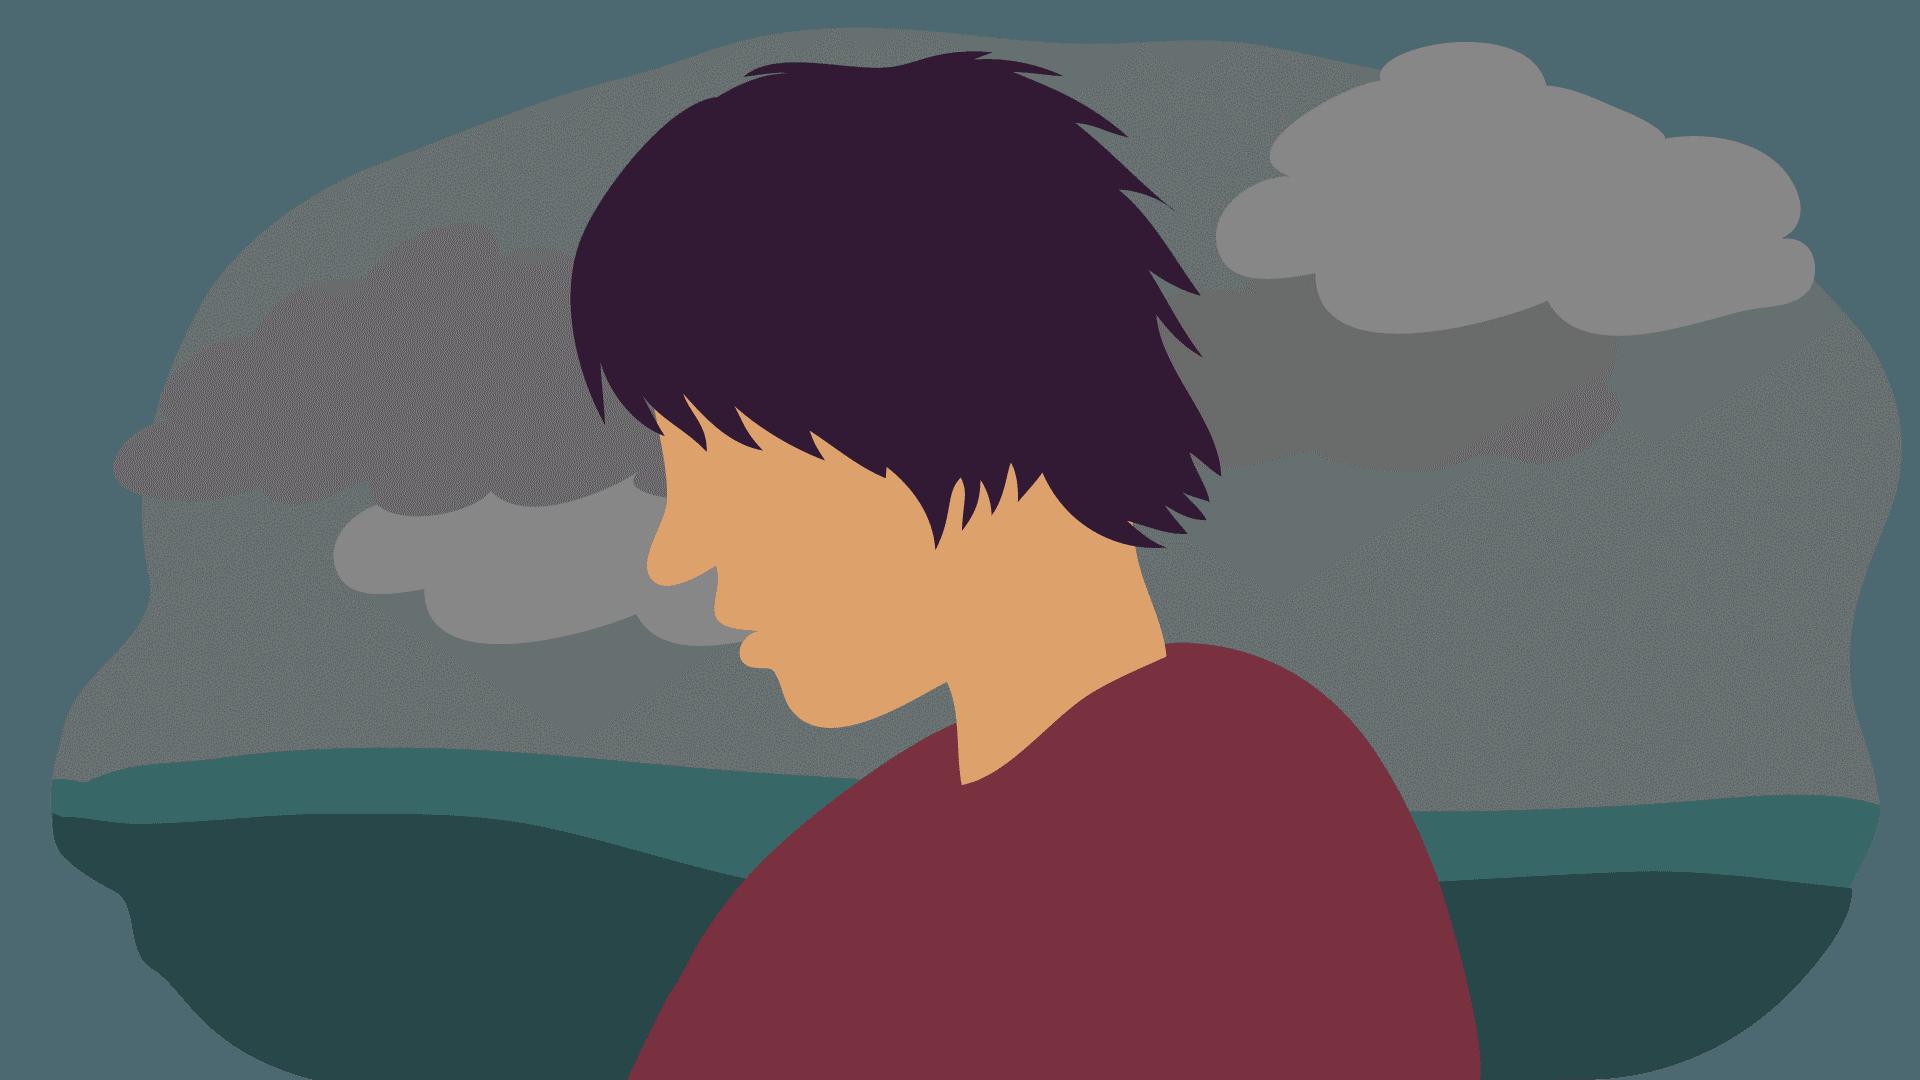 Depression clipart major depressive disorder. Blog biobehavioral research of